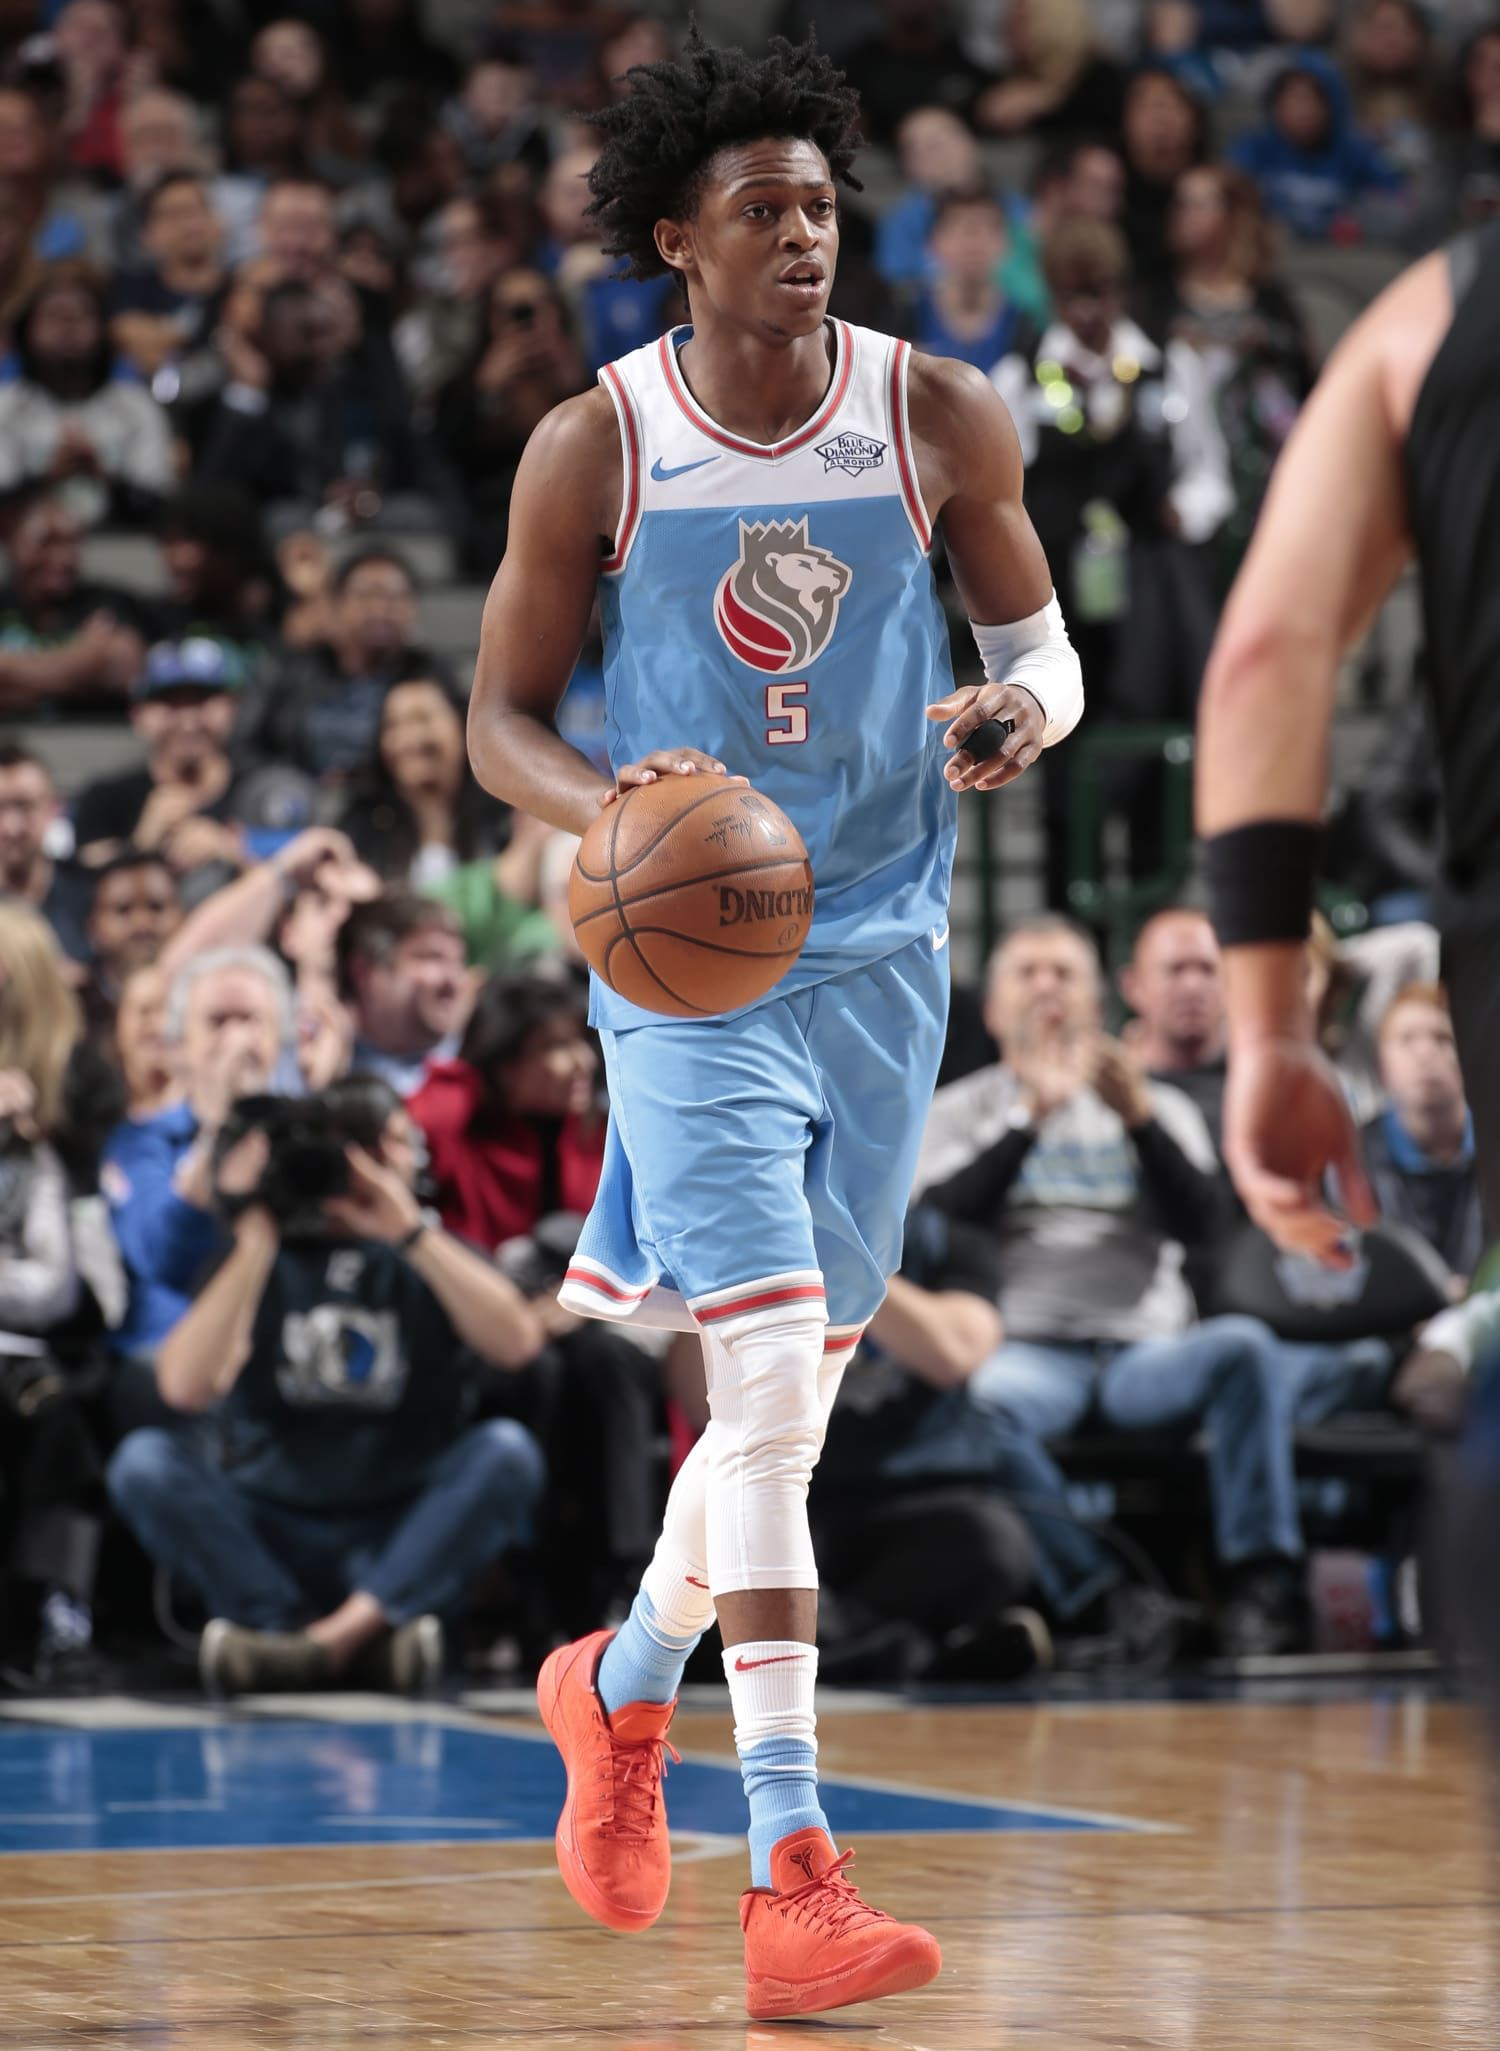 Nba Kicks Of The Night Slamonline Sports Jersey Design Basketball Compression Pants Nba